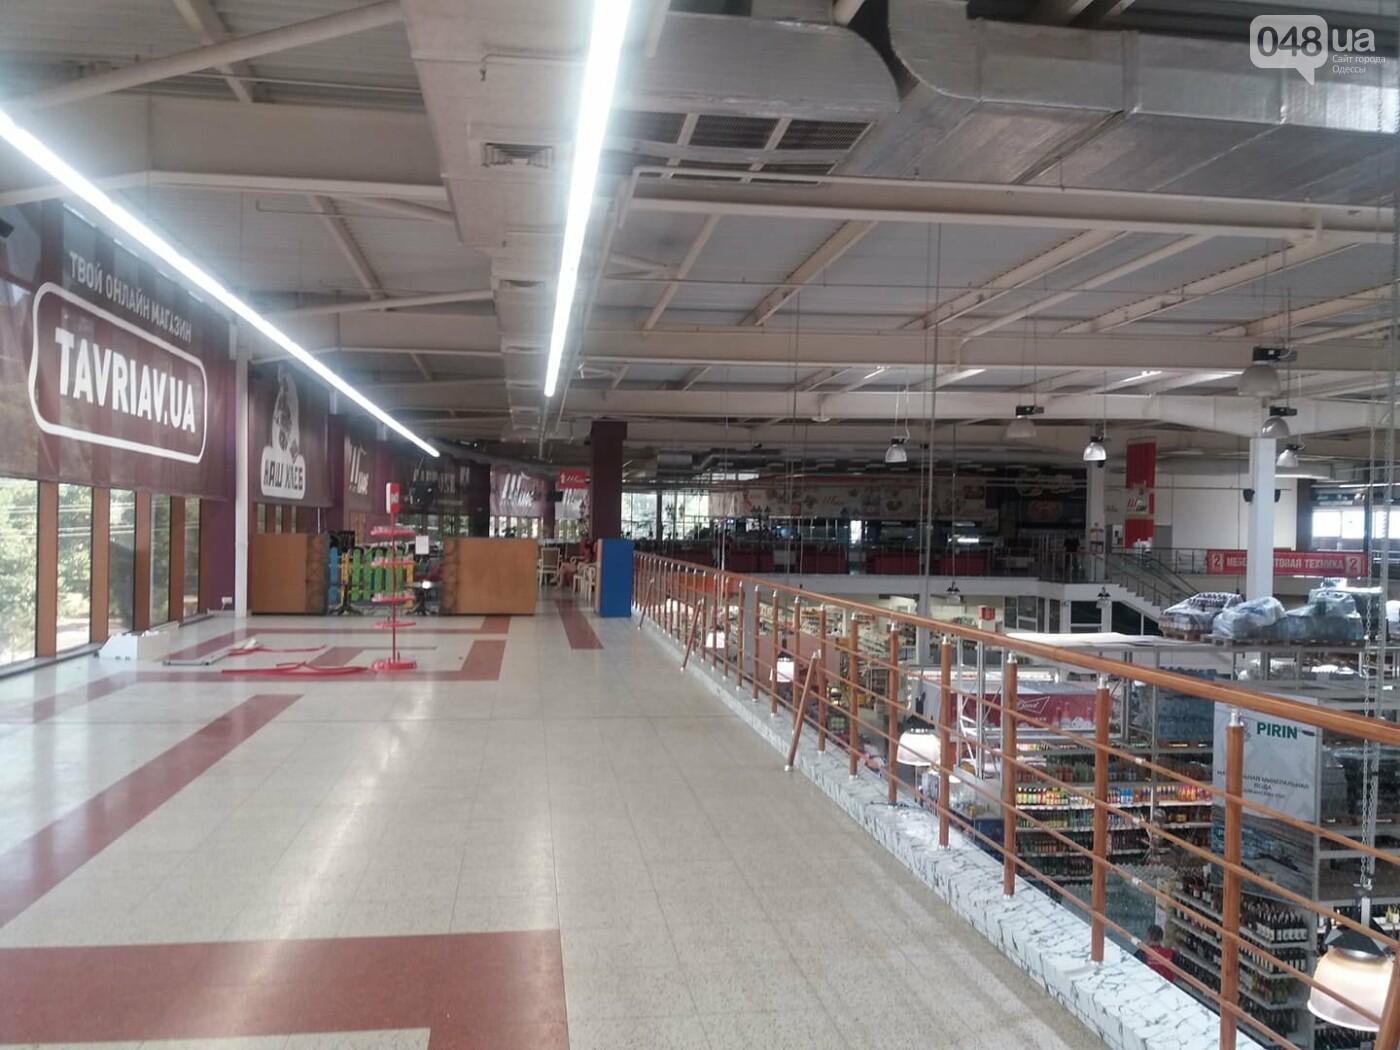 Одесский супермаркет «завязал» с живодерством: на долго ли, - ФОТО , фото-1